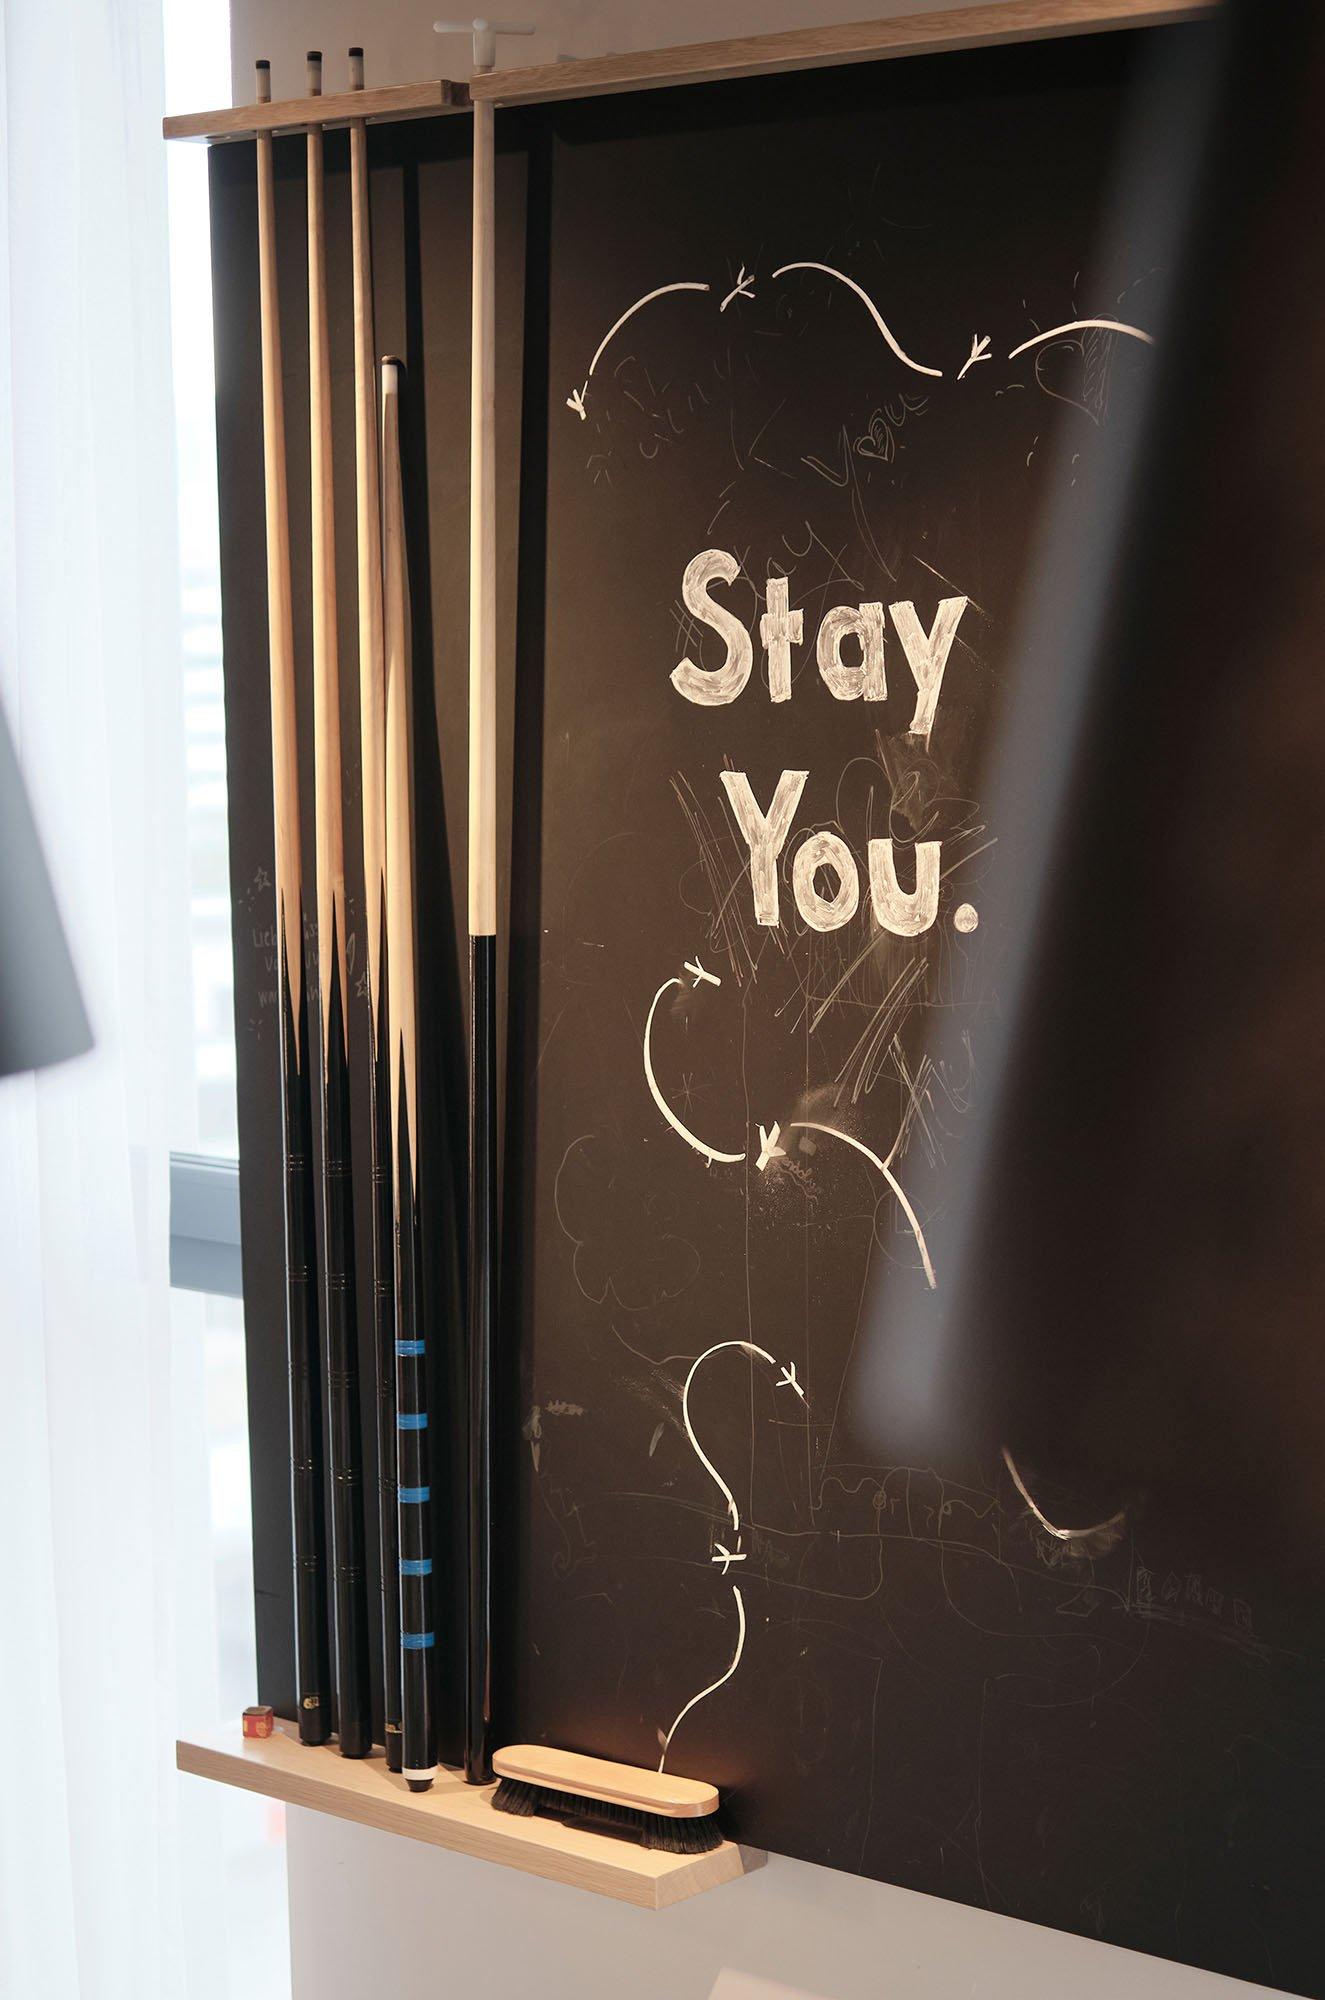 Stay KooooK - Stay You - _Fotocredits by Christian Kretschamr